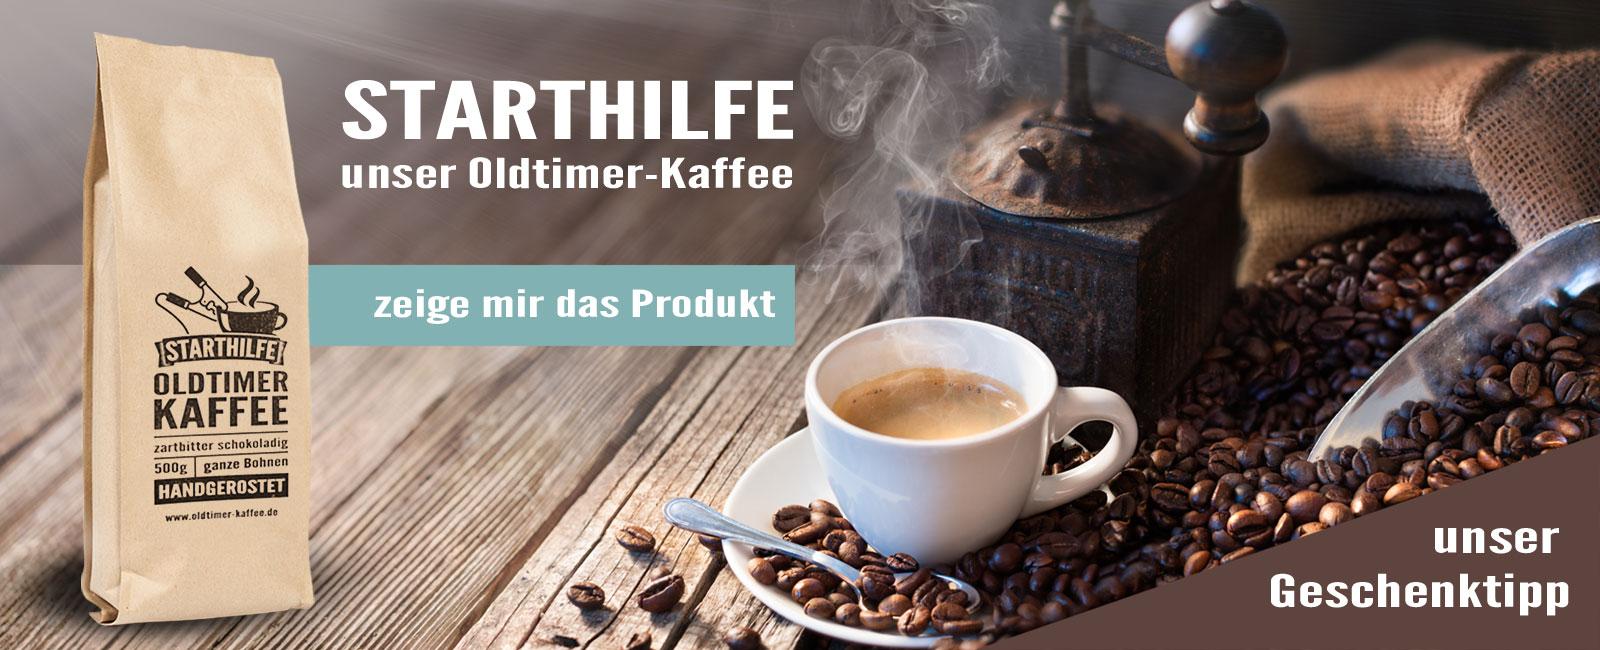 STARTHILFE-Oldtimerkaffee